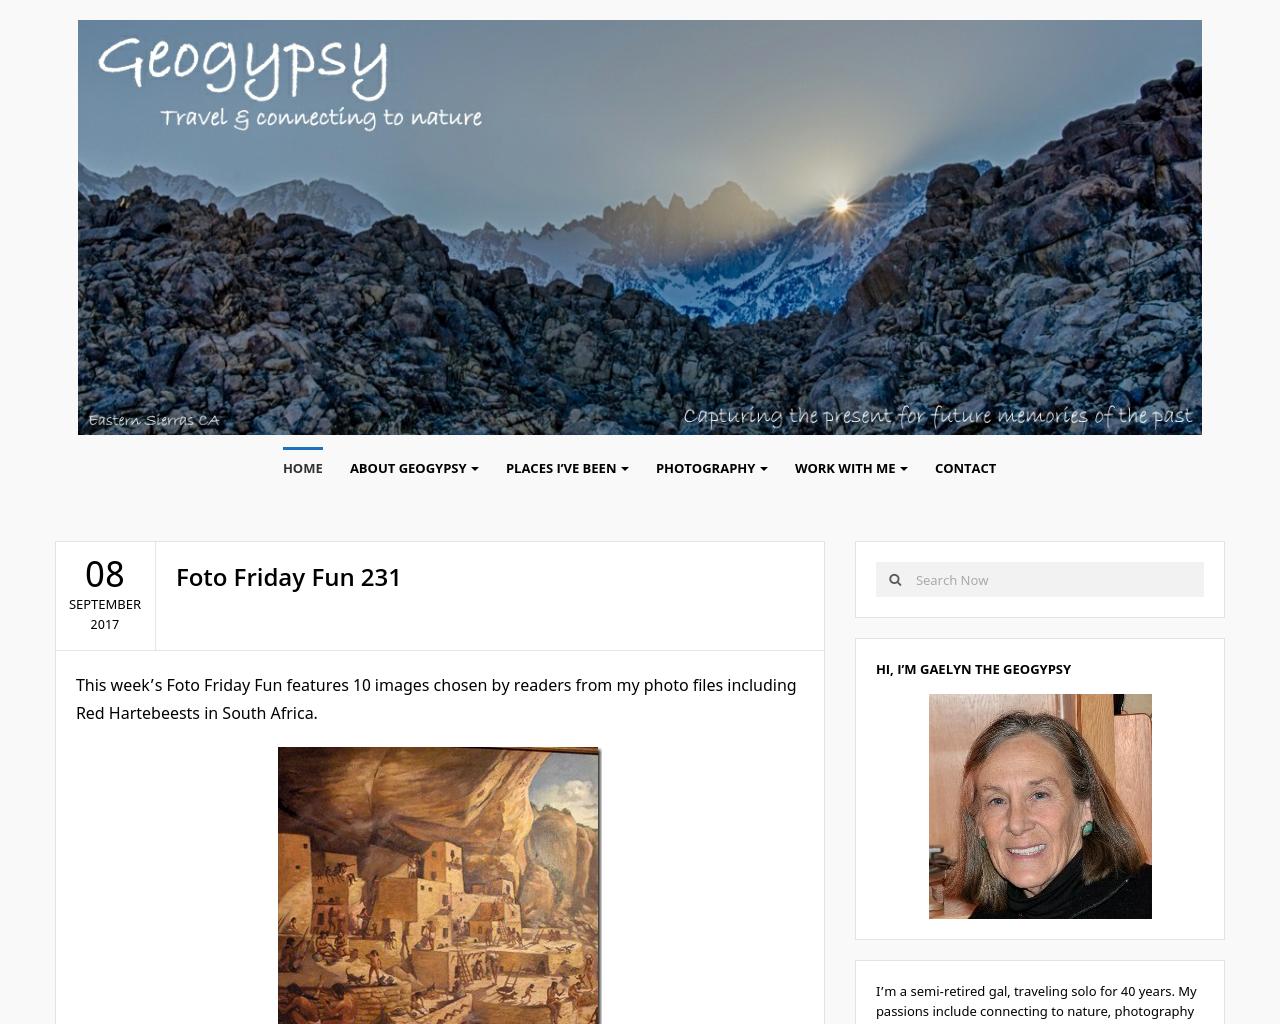 Geogypsytraveler-Advertising-Reviews-Pricing